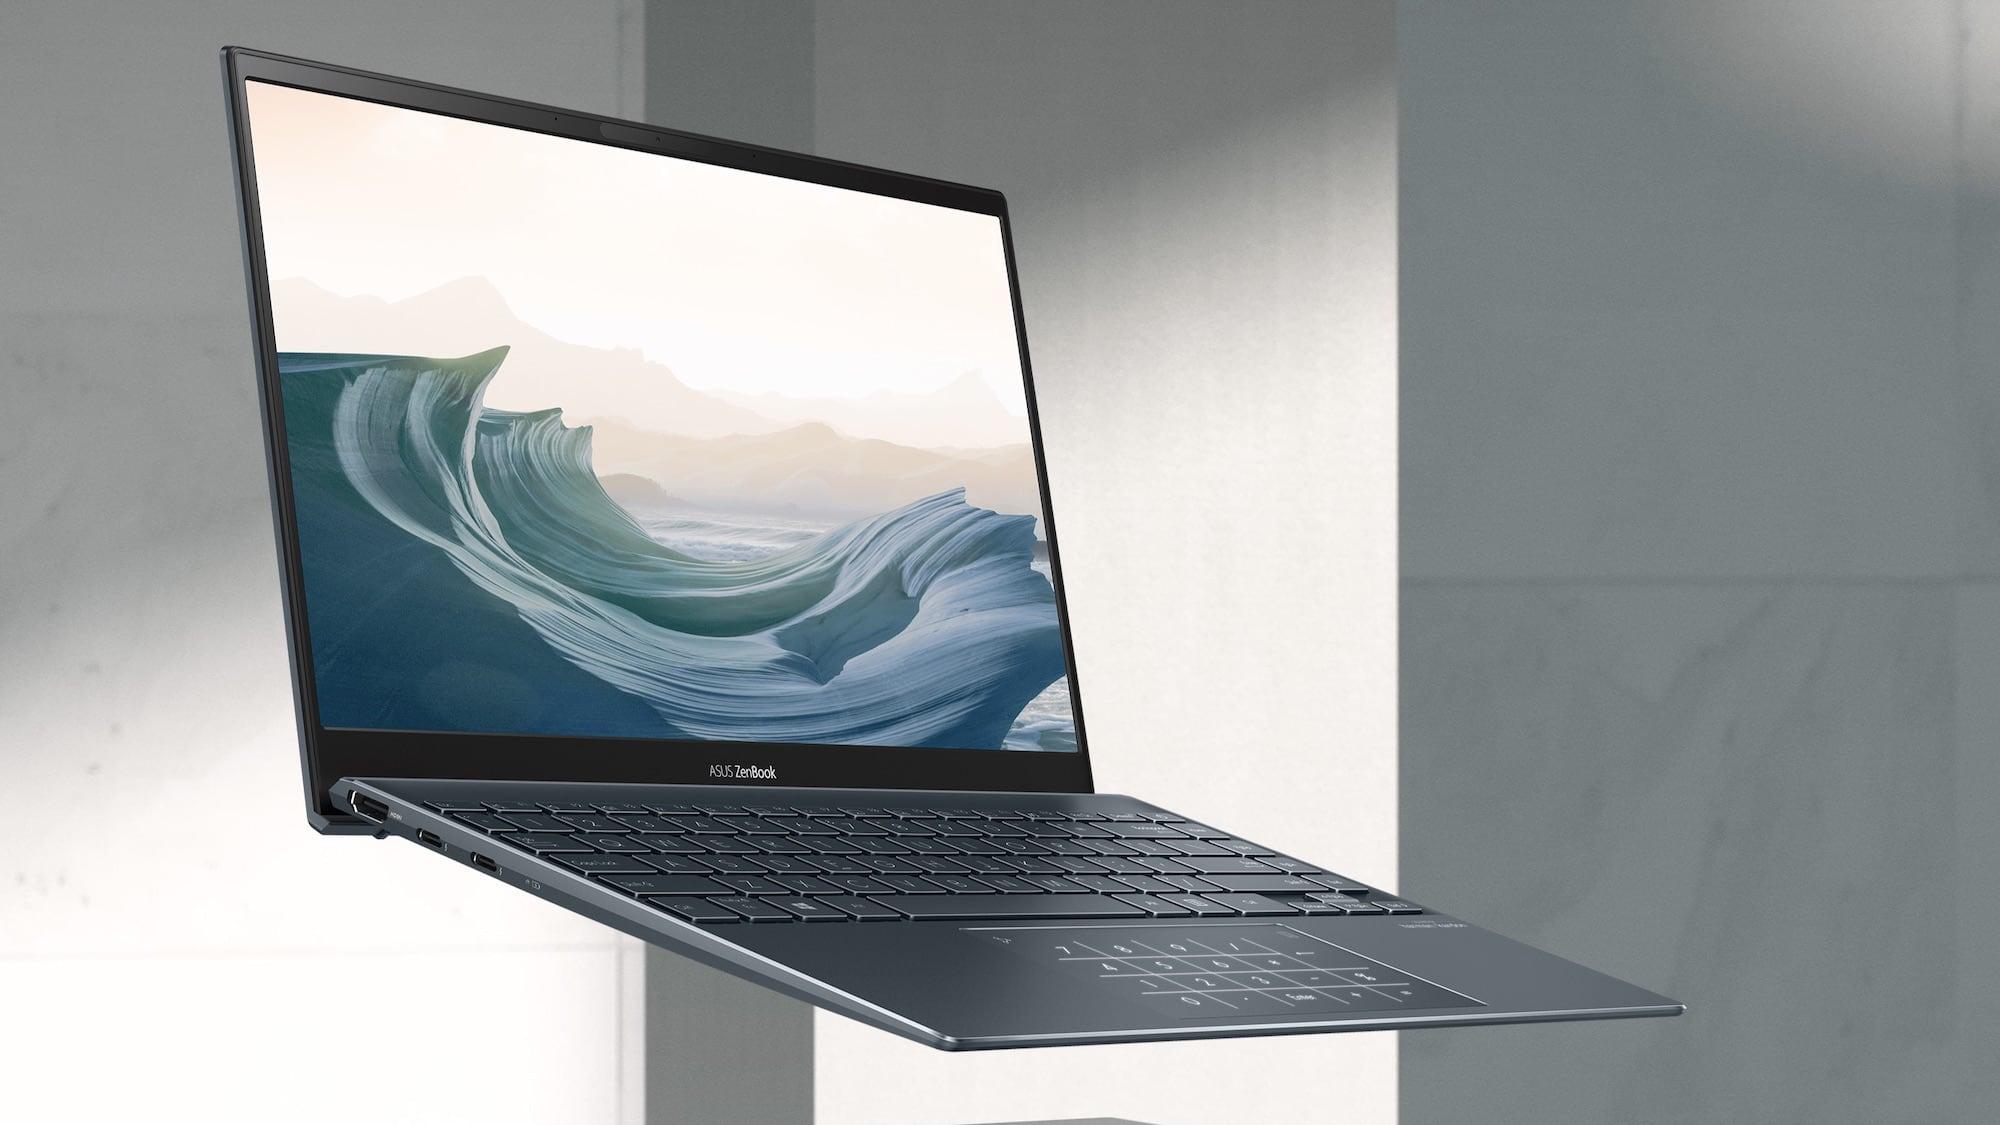 ASUS UX325 ZenBook 13 Thin Laptop